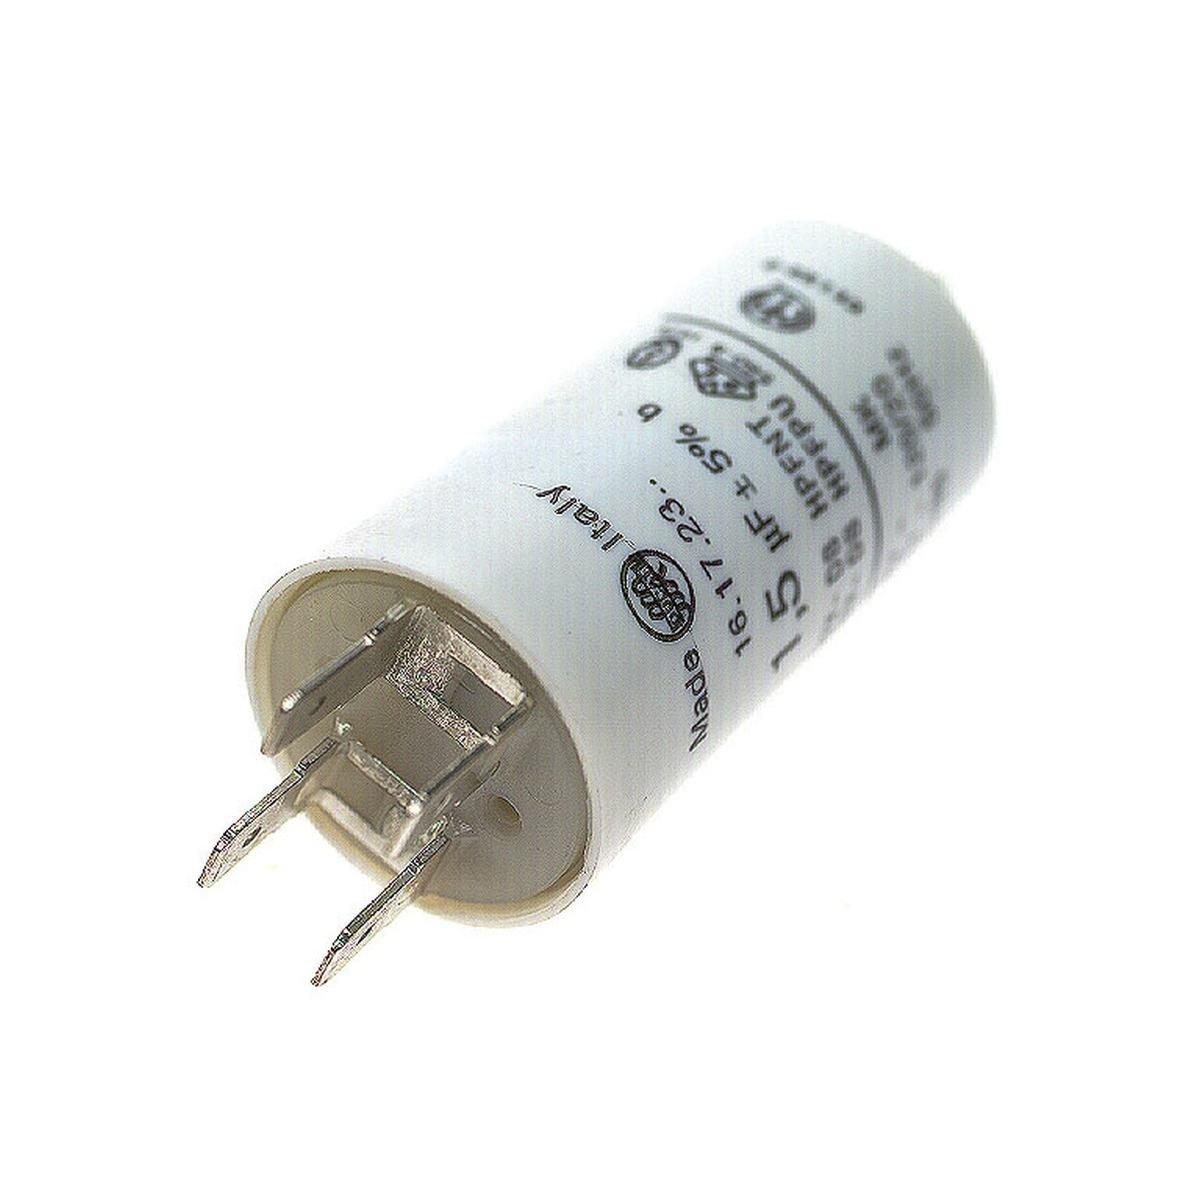 Kondensator 12,5 µF 450V